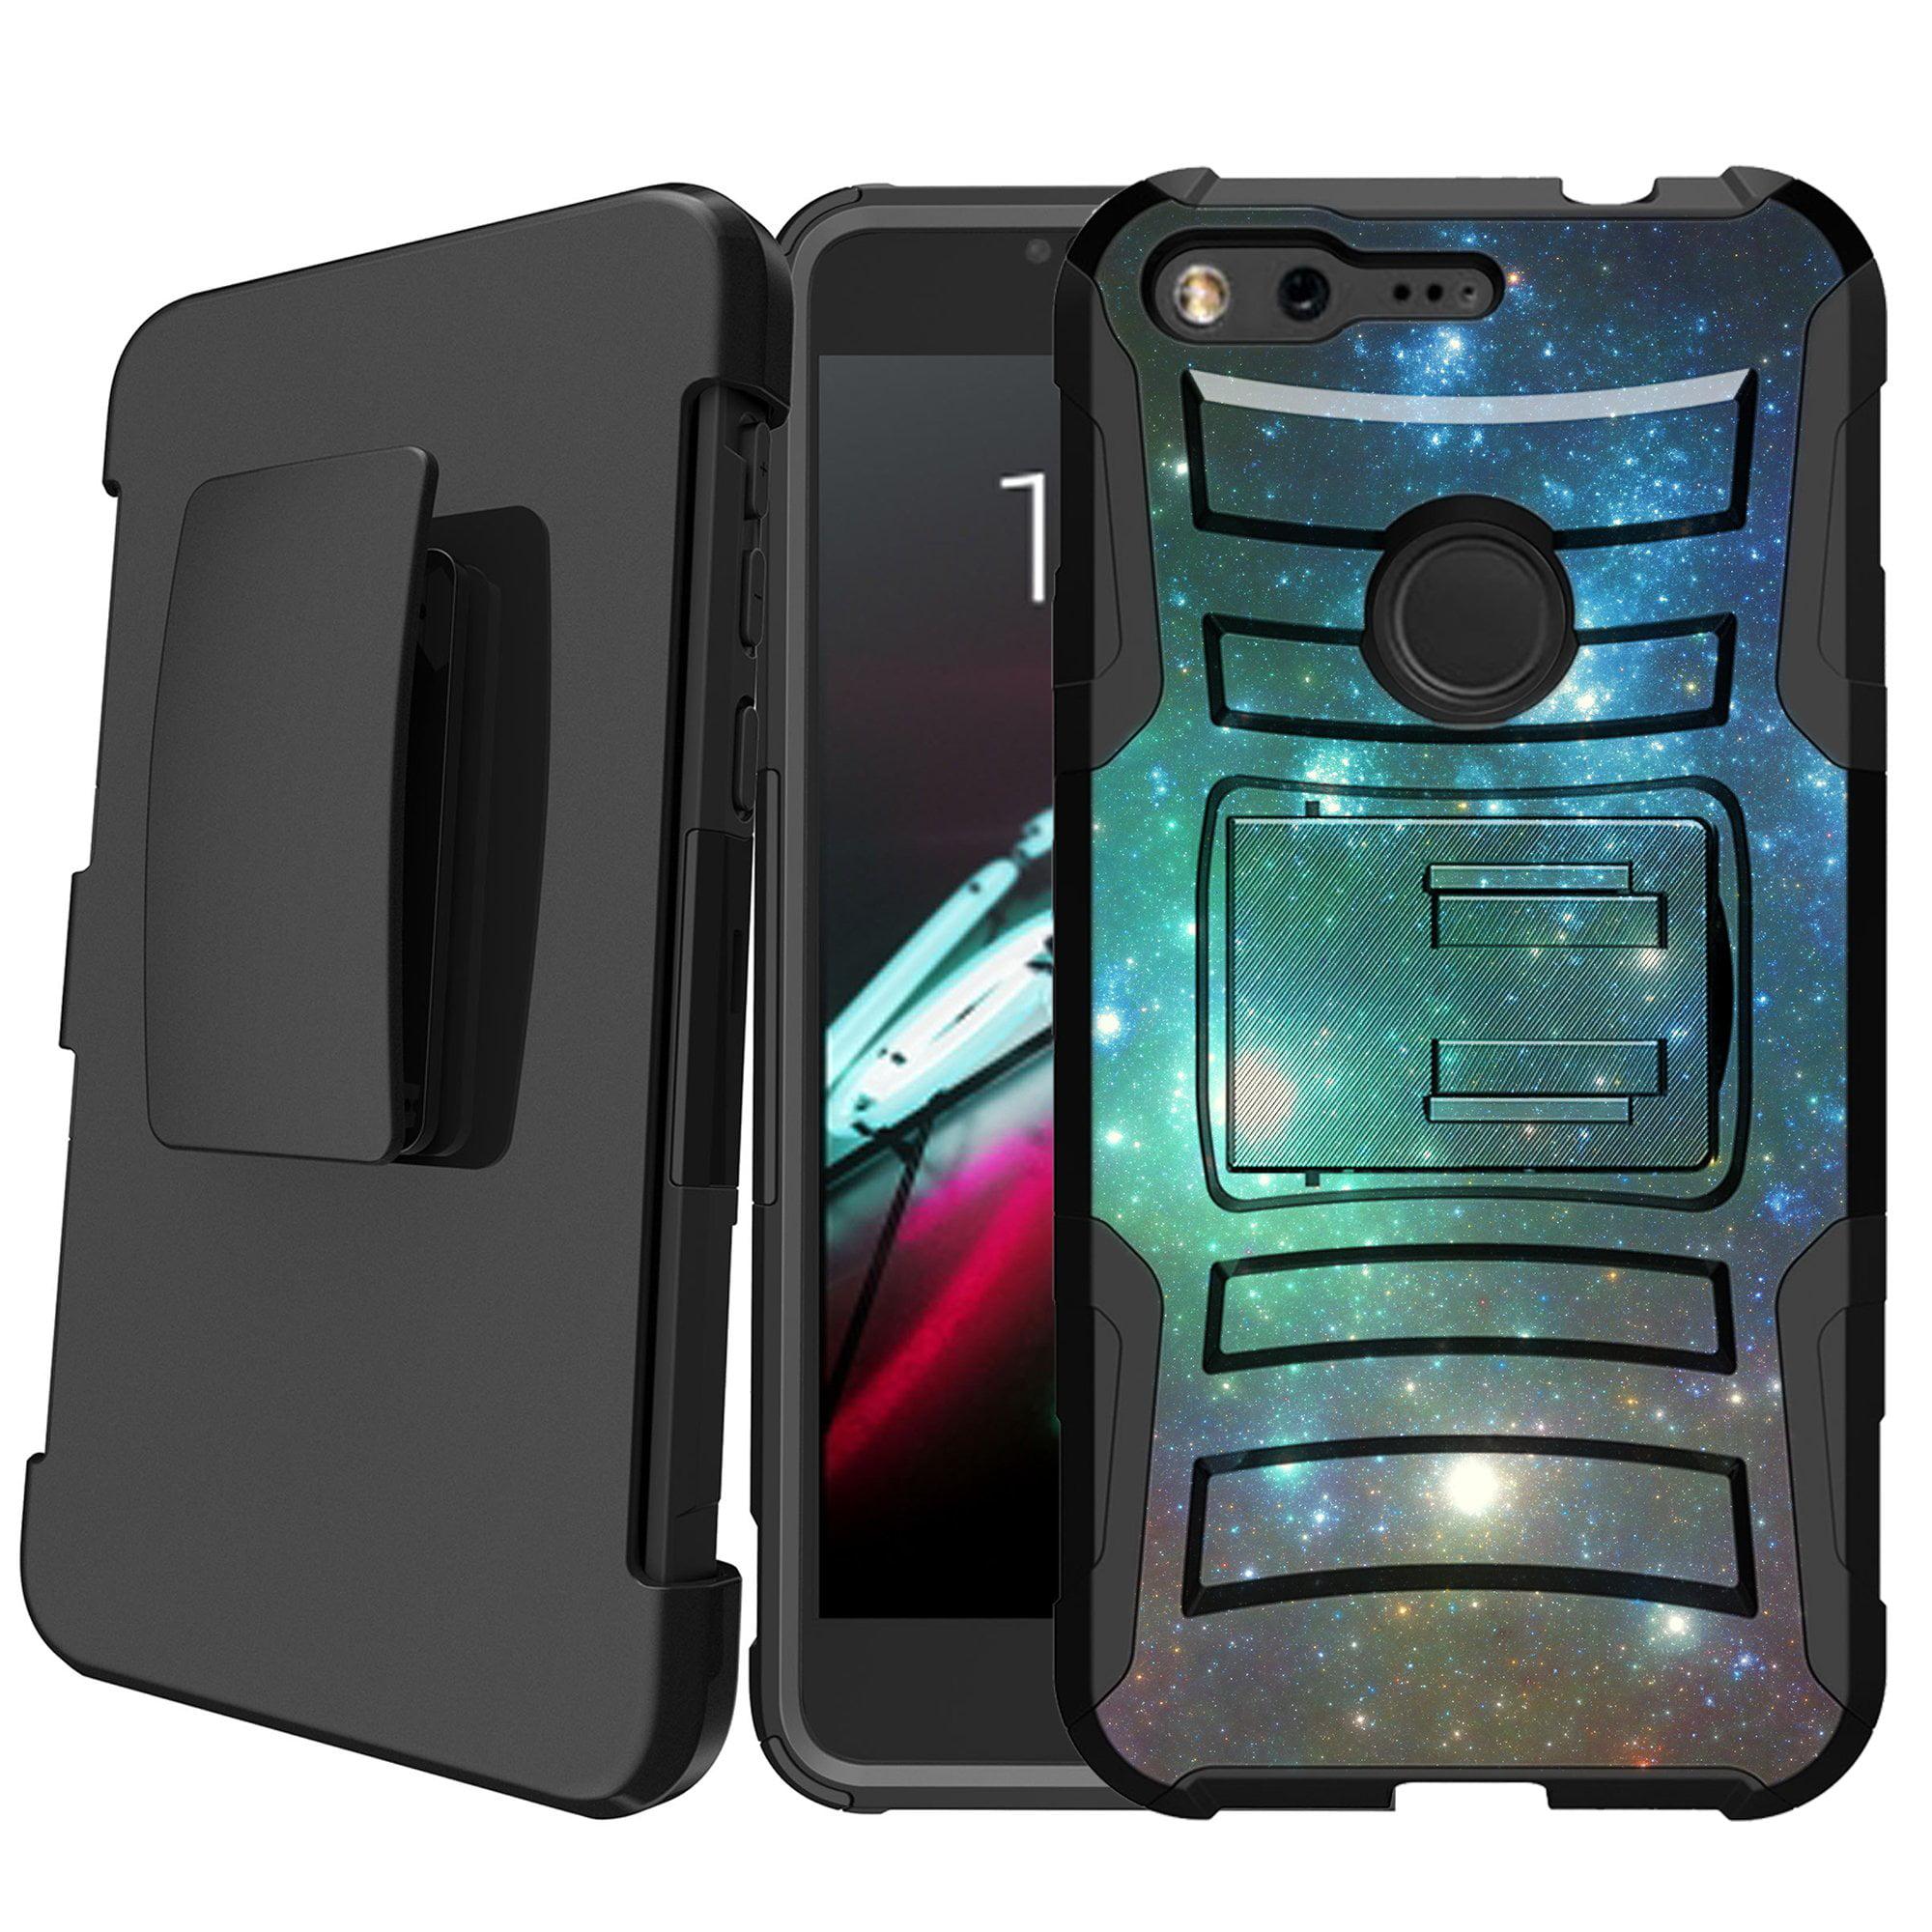 Google Pixel Holster Case [Galaxy Case][Galactic Phone Case Series] w/ Built-In Kickstand + Bonus HolsterGreen Blue Galaxy